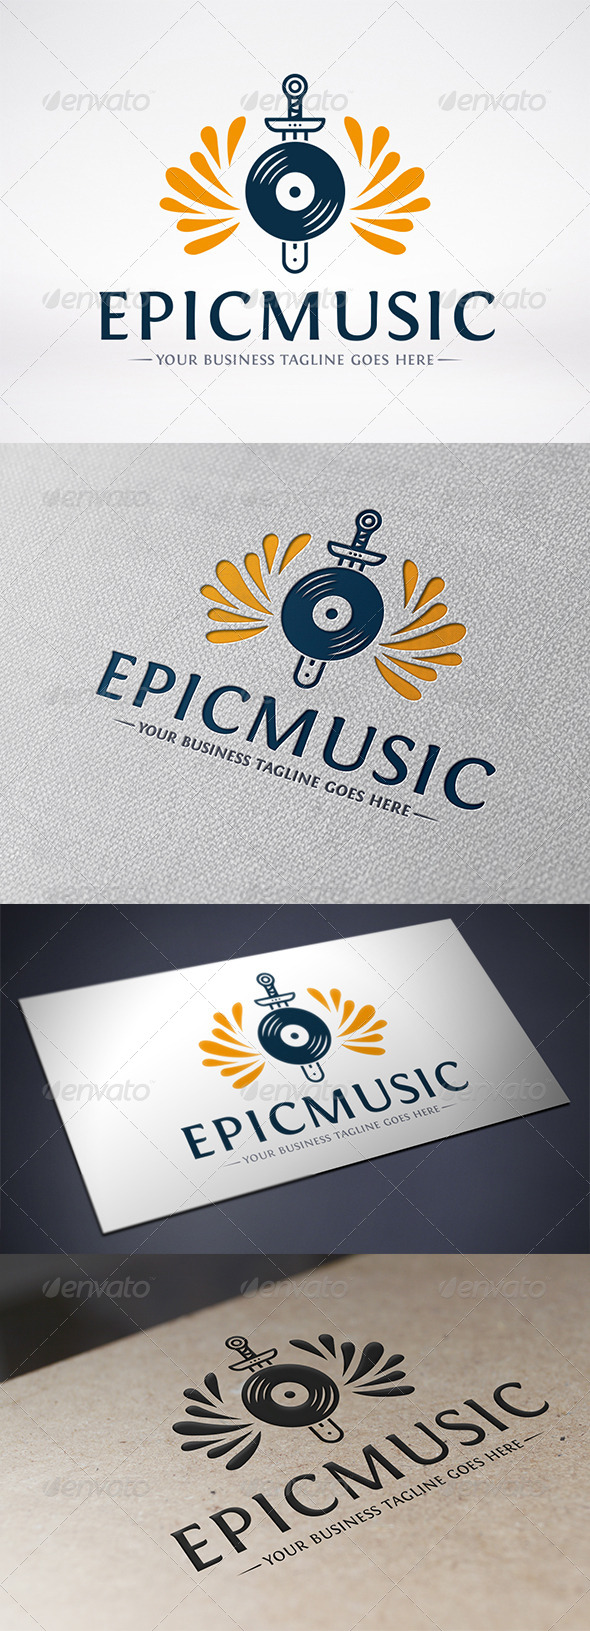 GraphicRiver Epic Music Logo Template 6583042